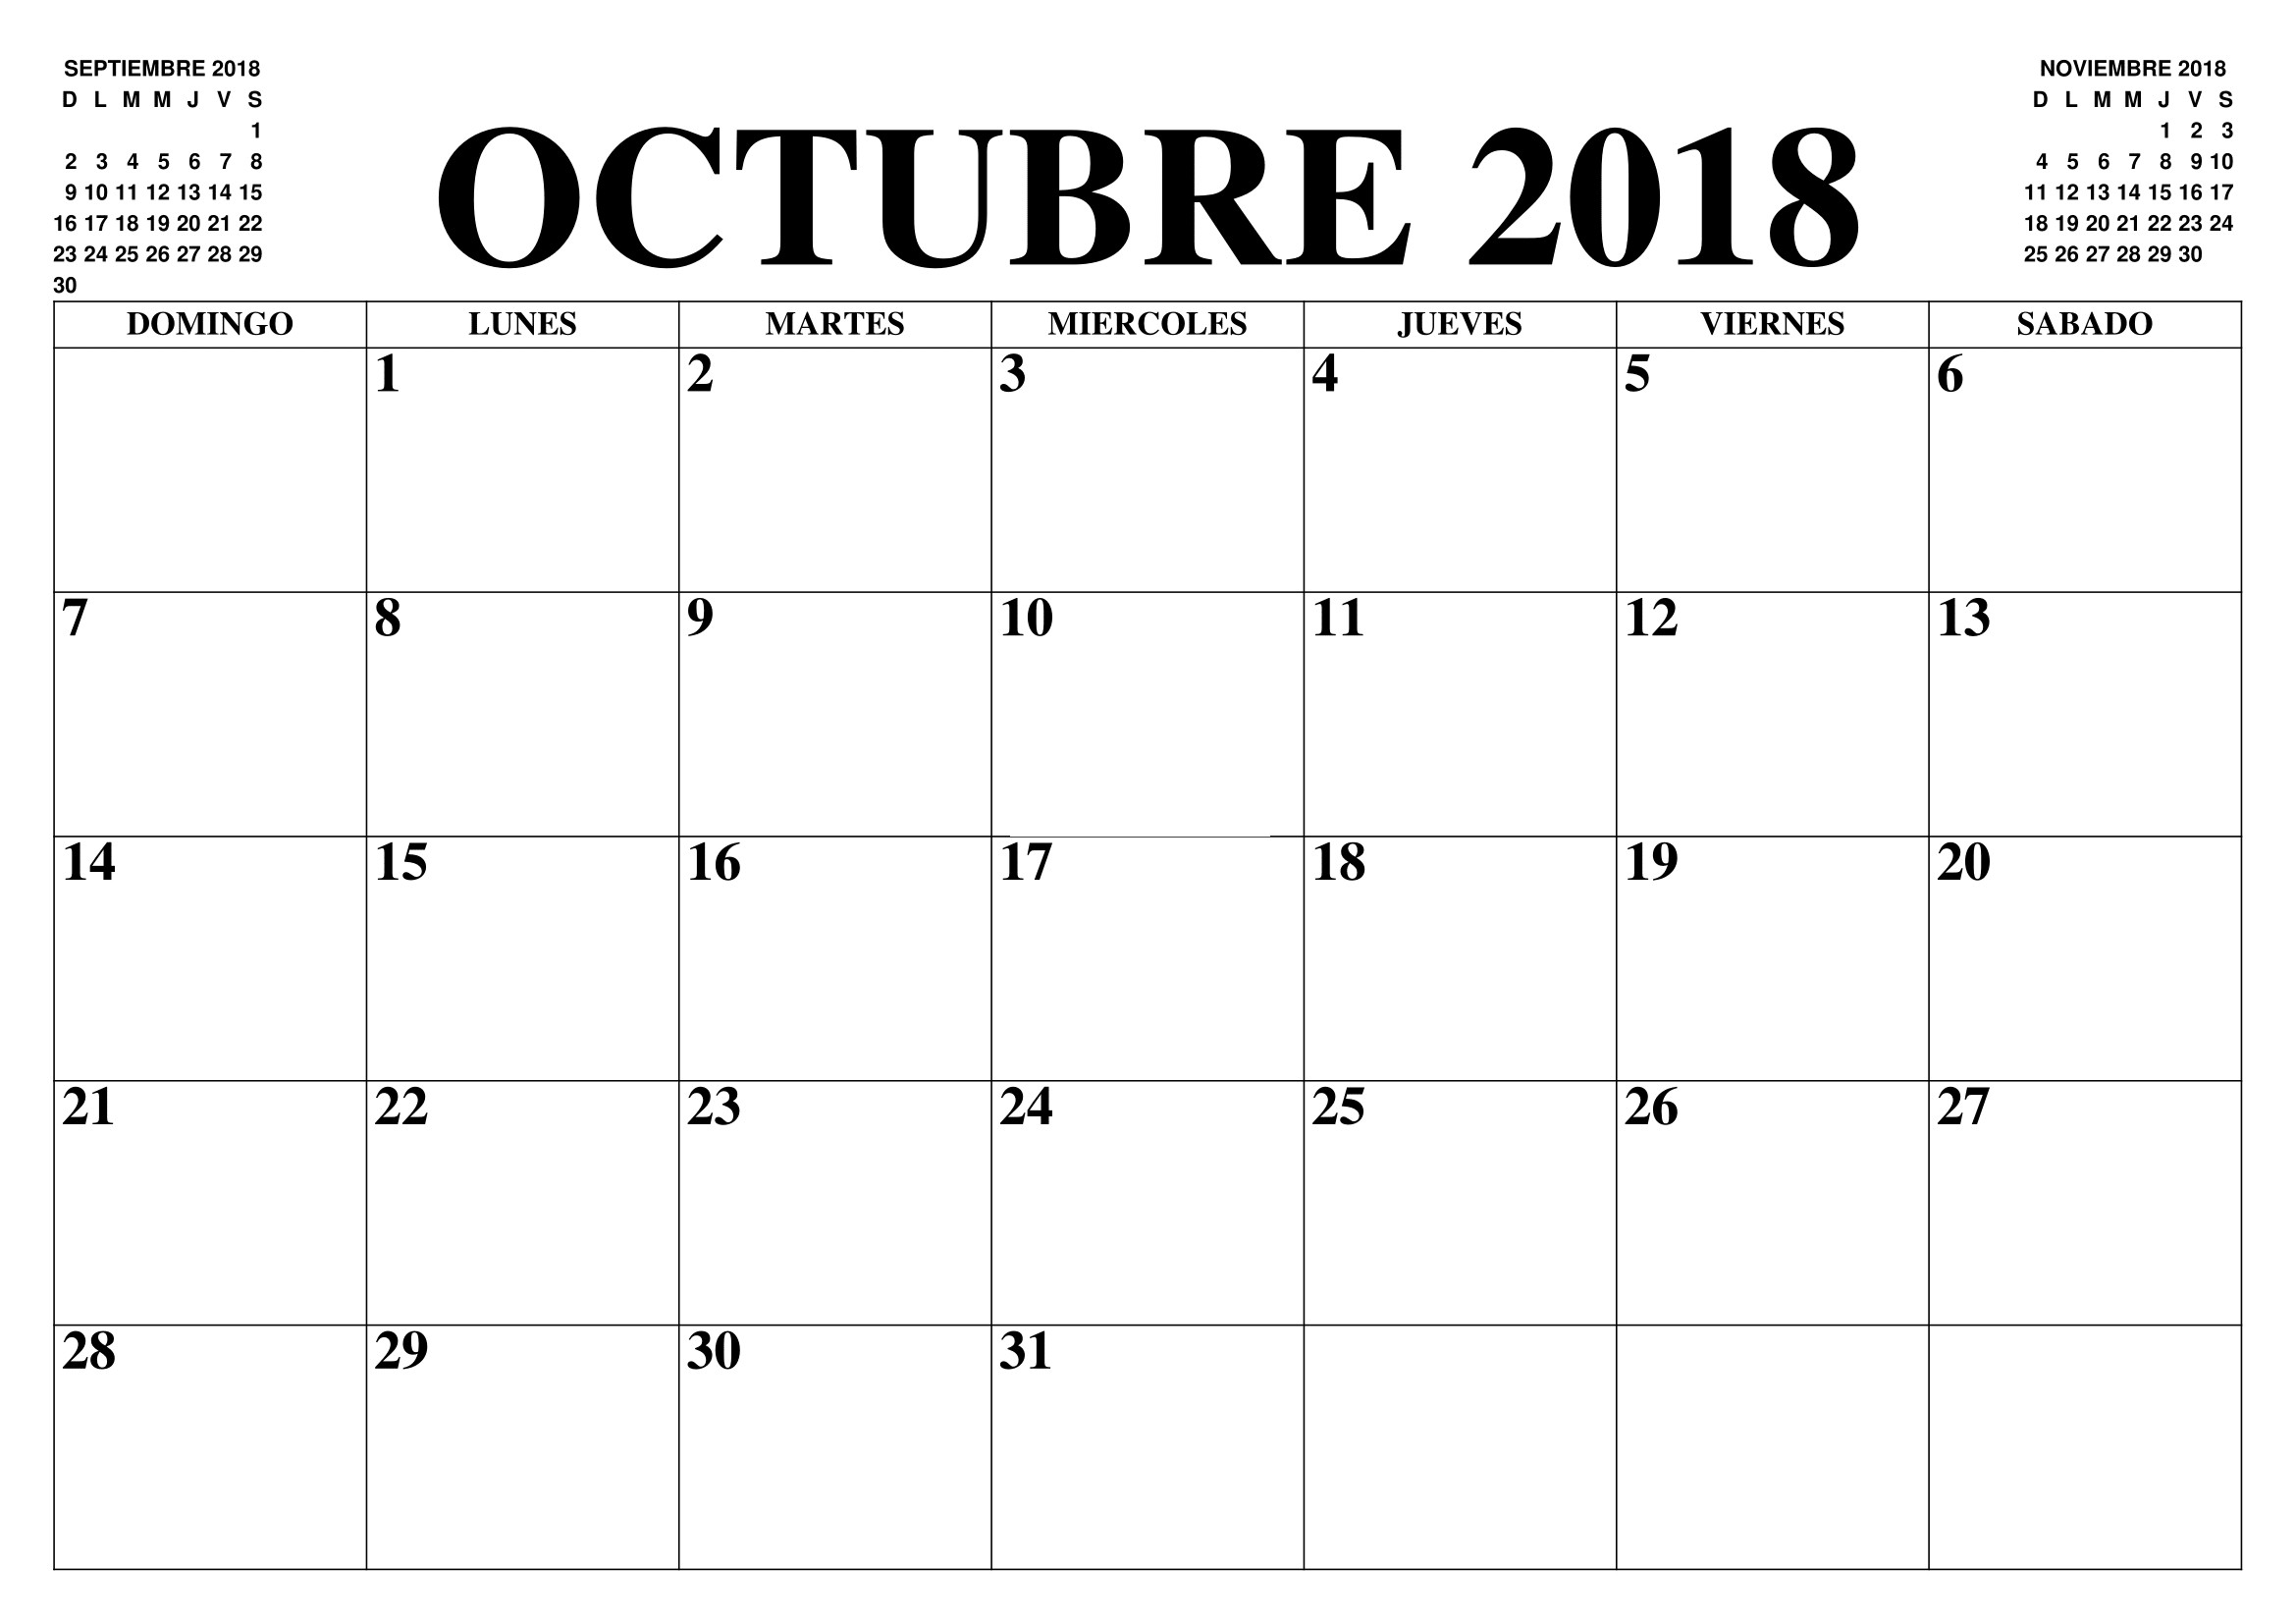 Diciembre 2018 AQUI Calendario 2018 Octubre Para Imprimir Oktober Chile Argentina Pdf October Calendar